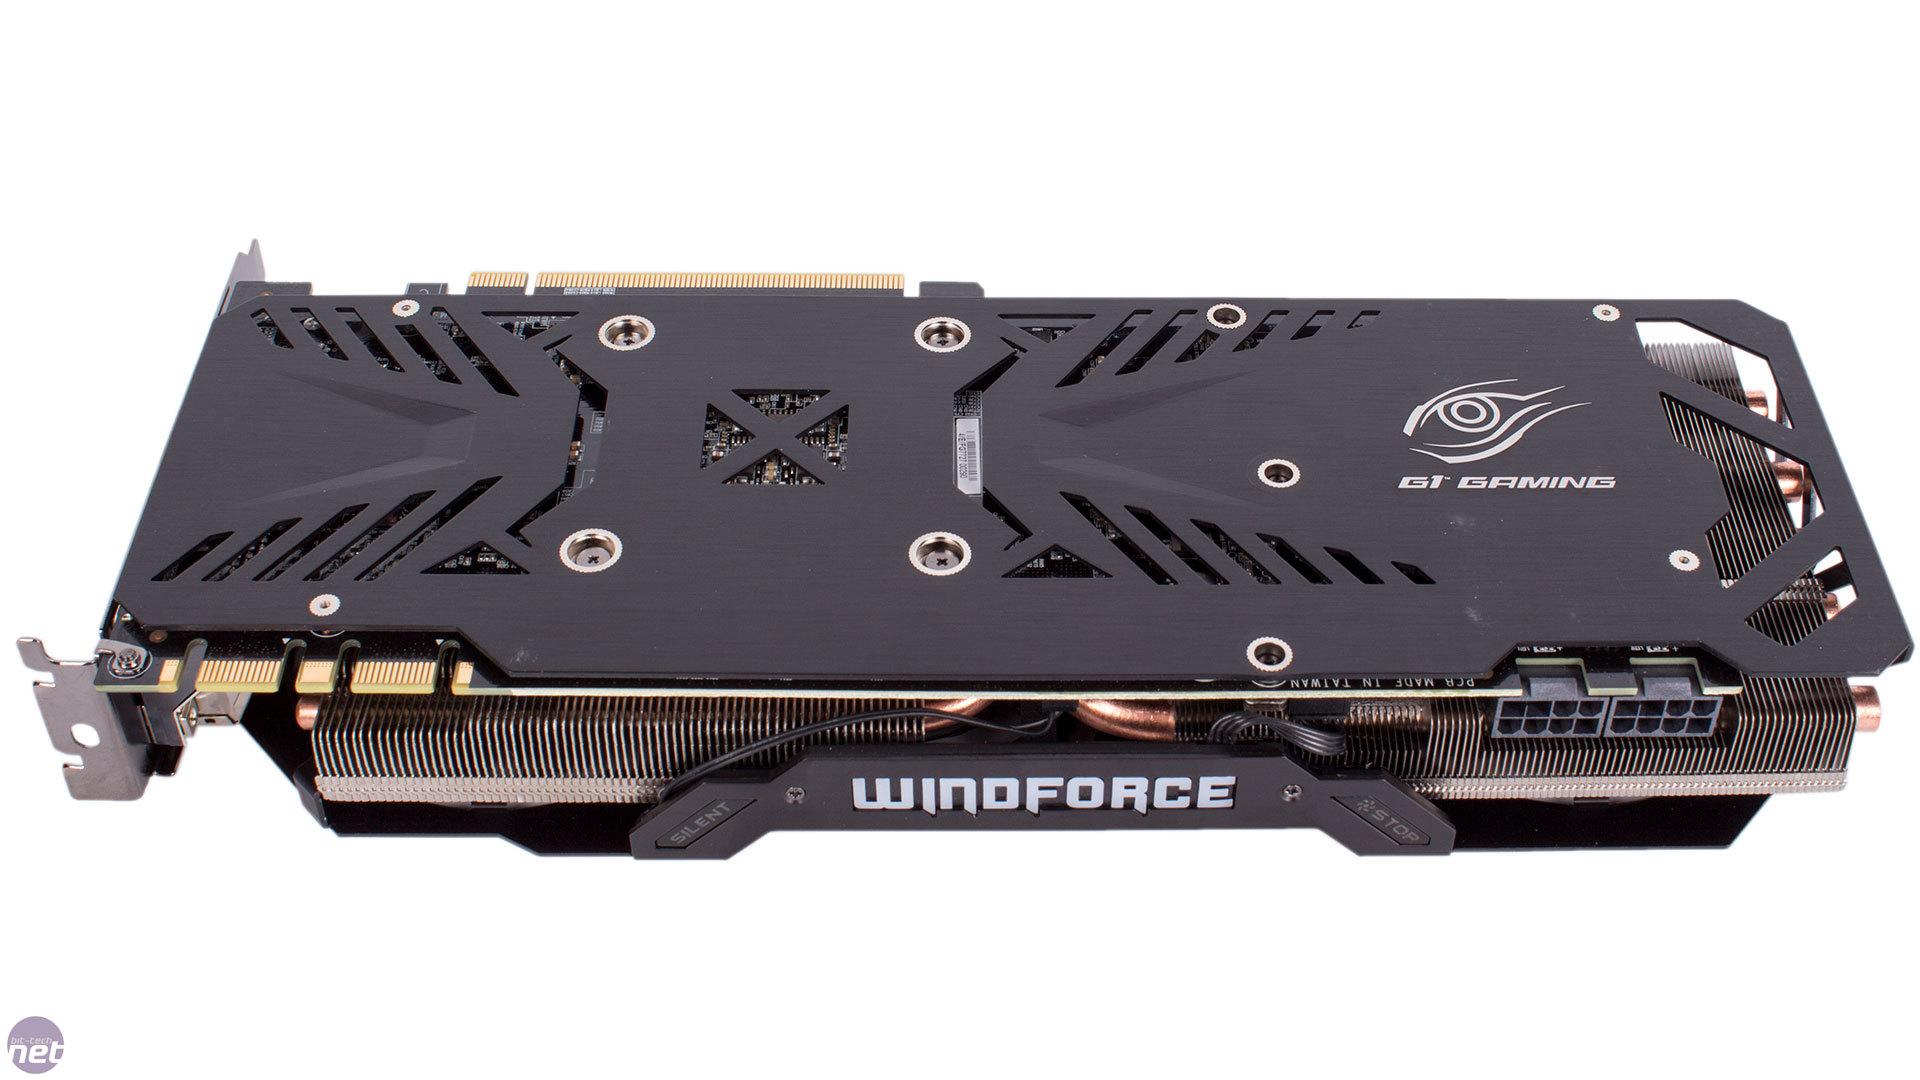 Gigabyte GeForce GTX 980 Ti G1 Gaming Review | bit-tech net